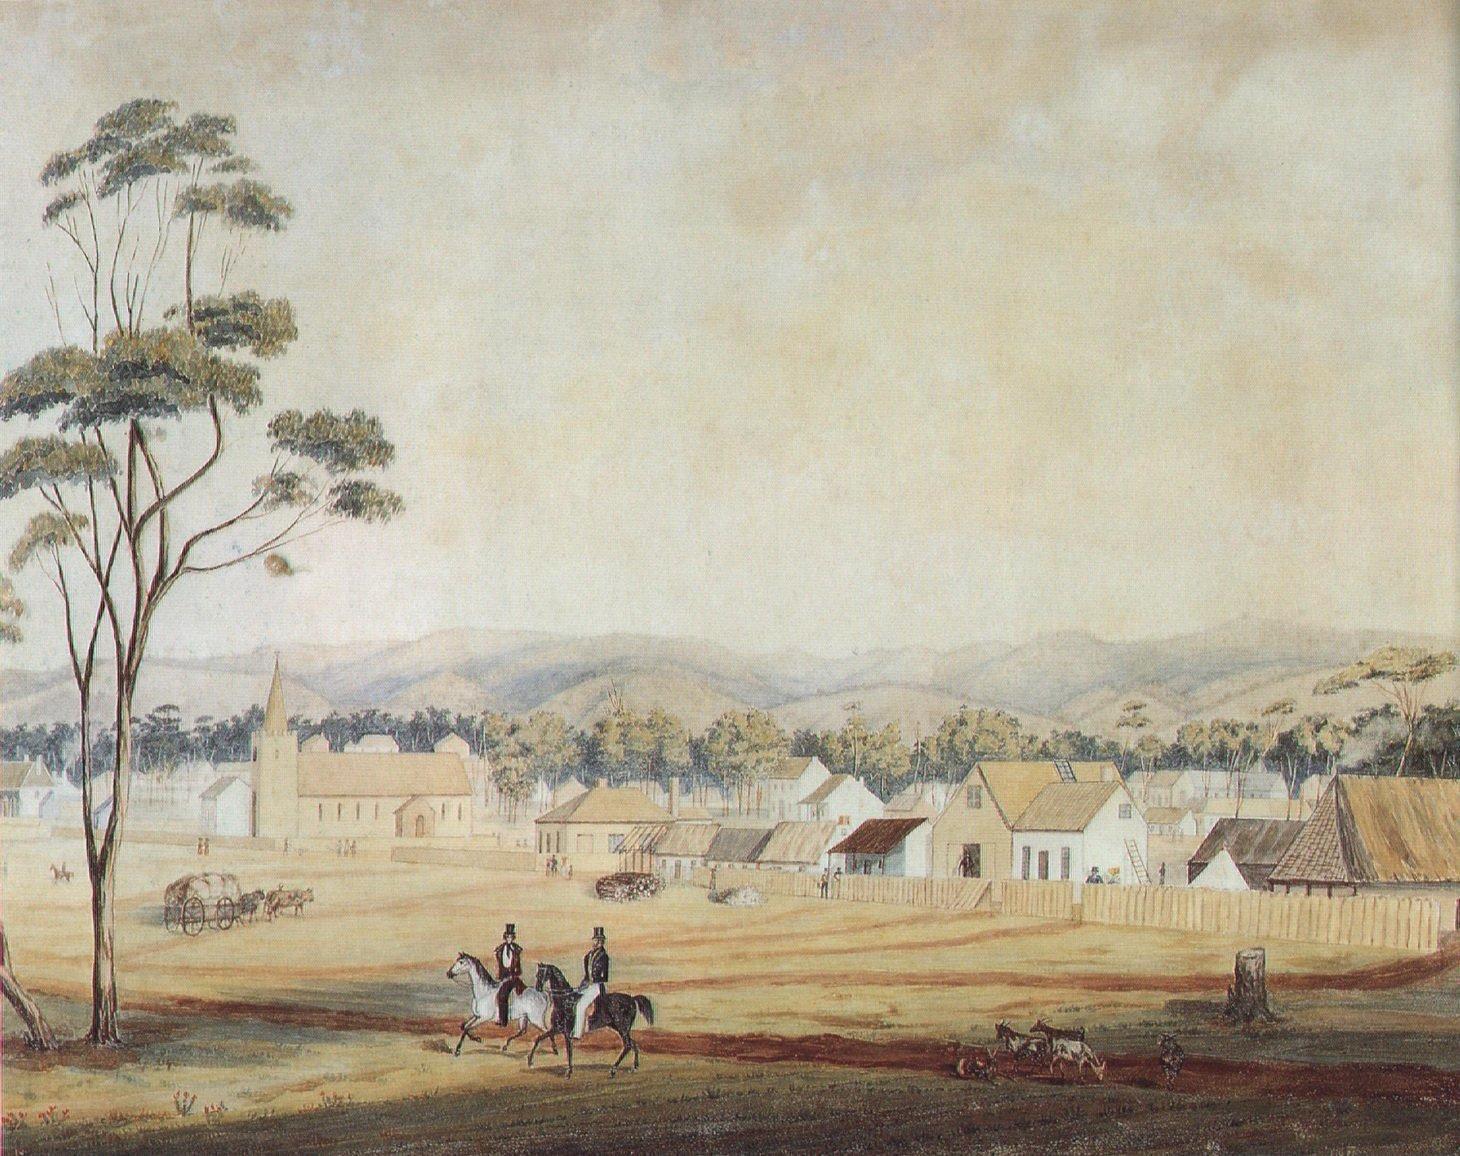 Female Emigration to Australia 1833-1837